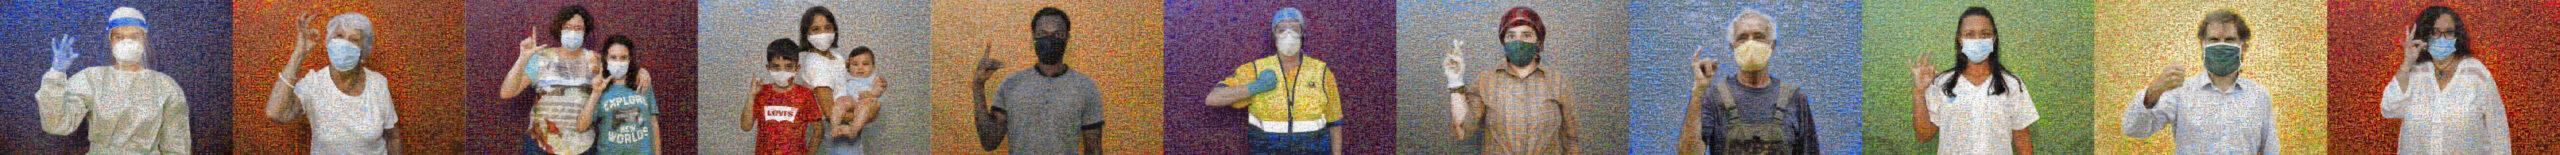 Aspecto que tendrá el mosaico Solidaritat, de Joan Fontcuberta, que tendrá 50 metros de largo, y mostrará a palabra solidaritat expresada en lengua de signos catalana